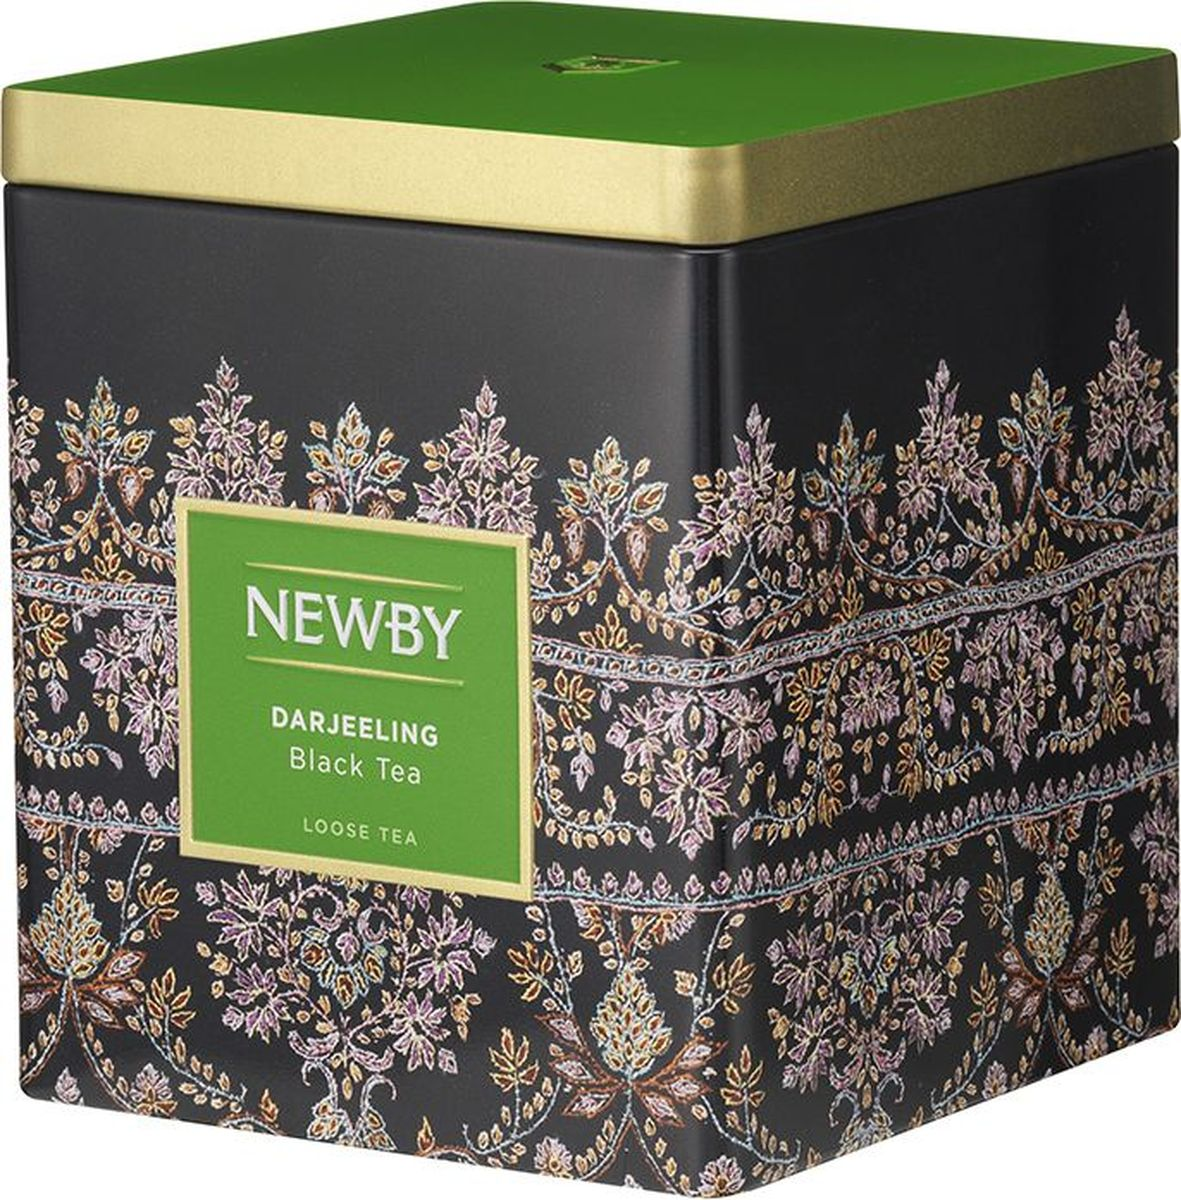 Newby Darjeeling черный листовой чай, 125 г newby chi chi sencha зеленый листовой чай 125 г